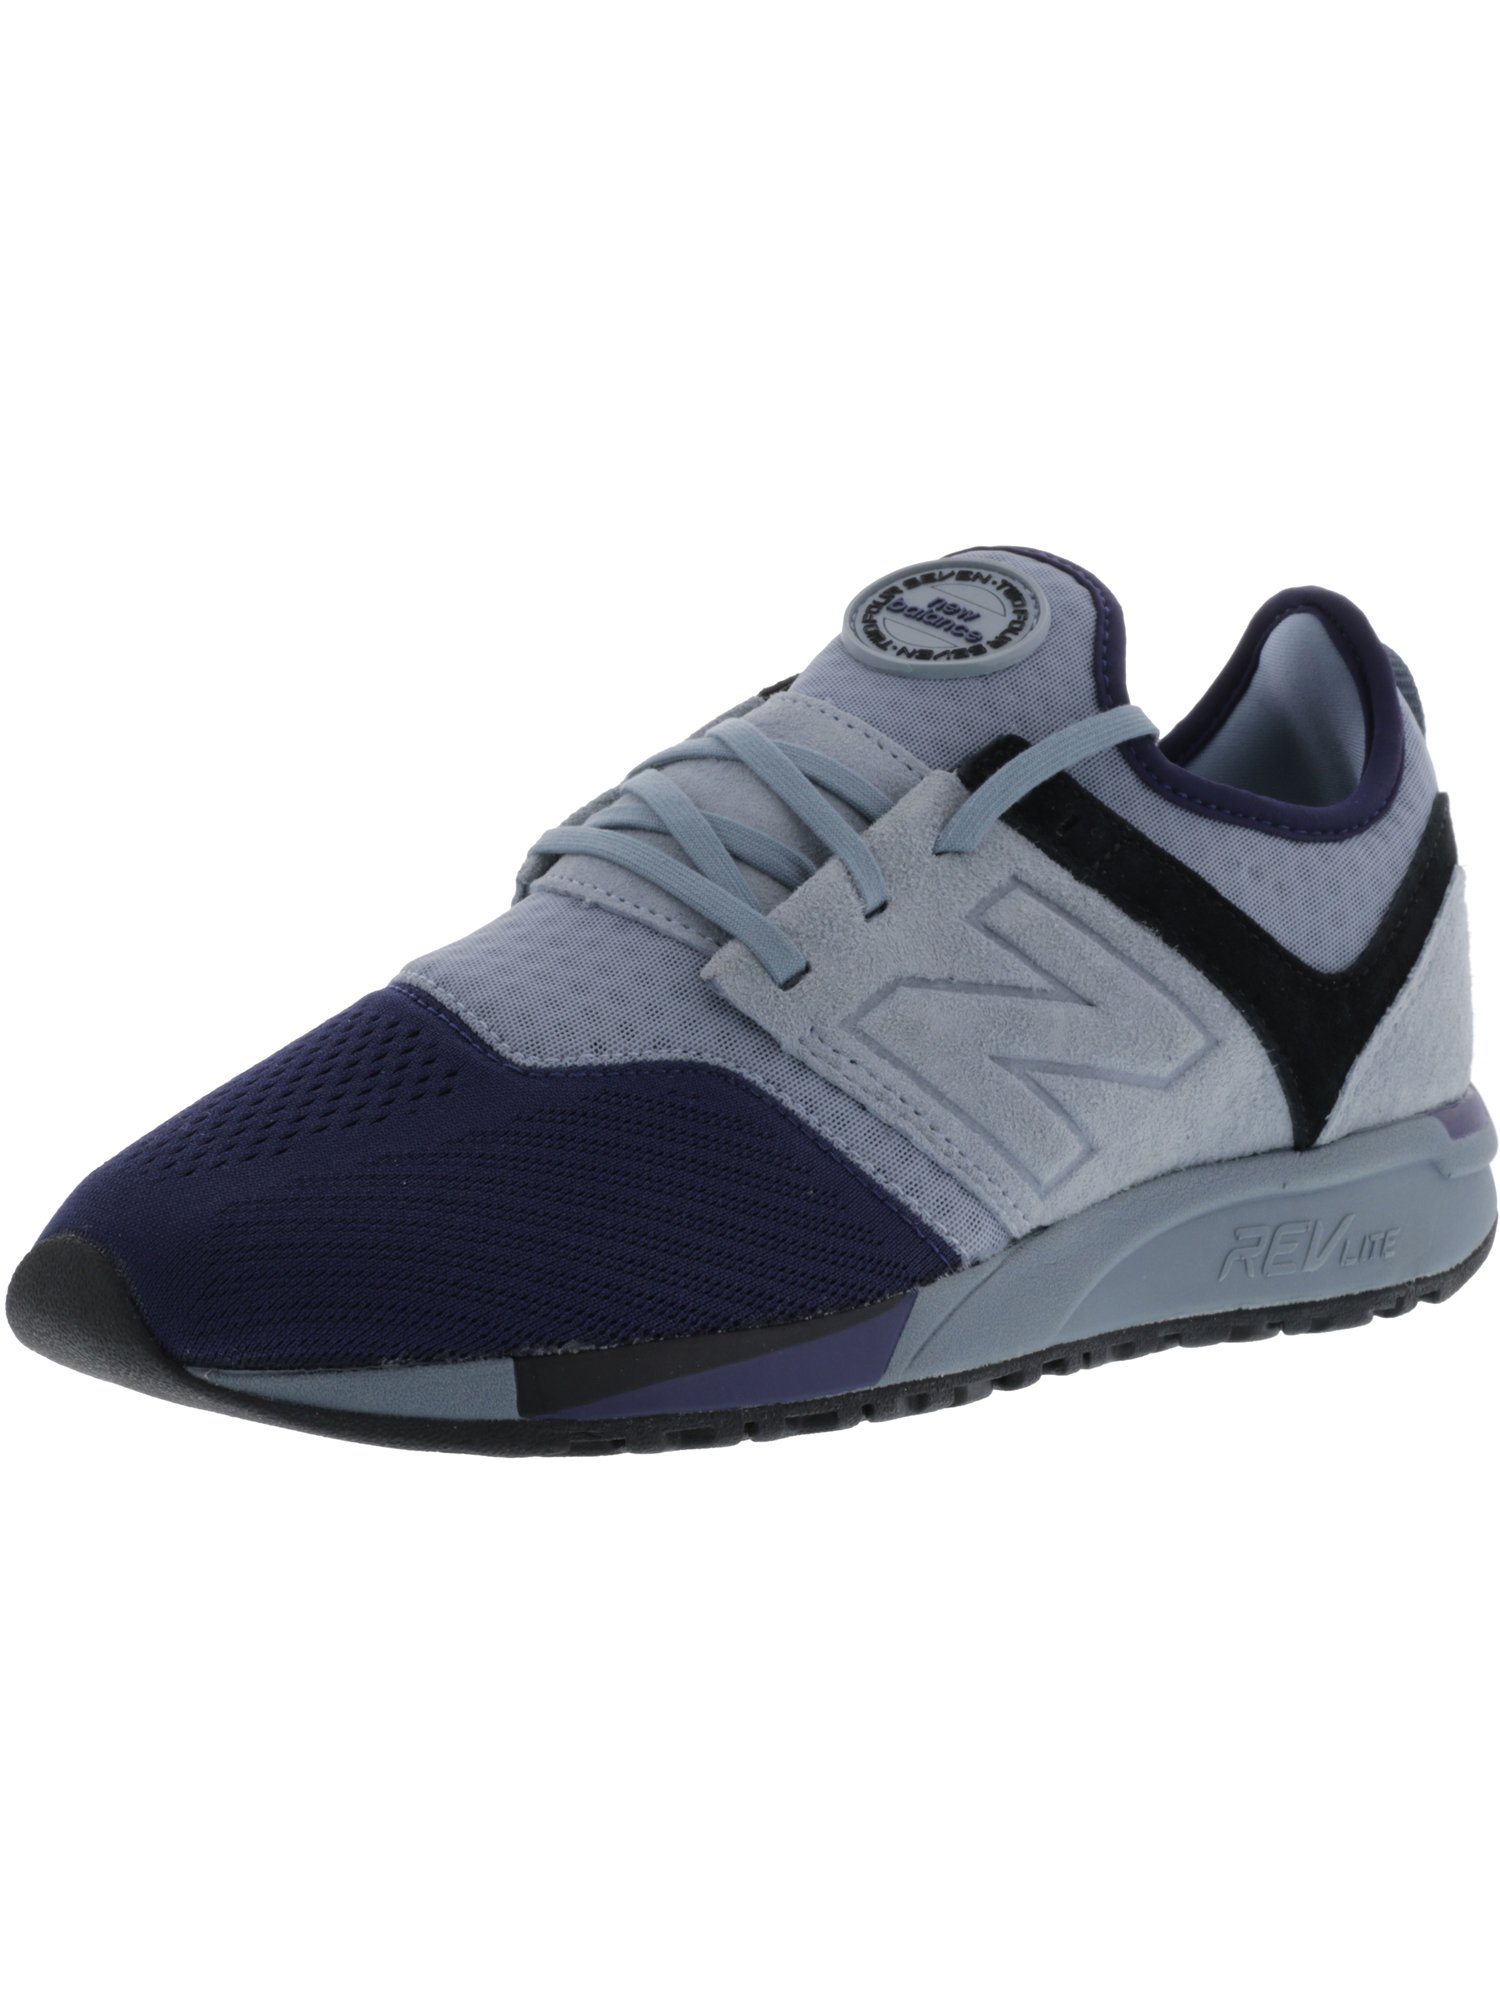 New Balance Men's Mrl247 Cy Ankle-High Running Shoe - 9M